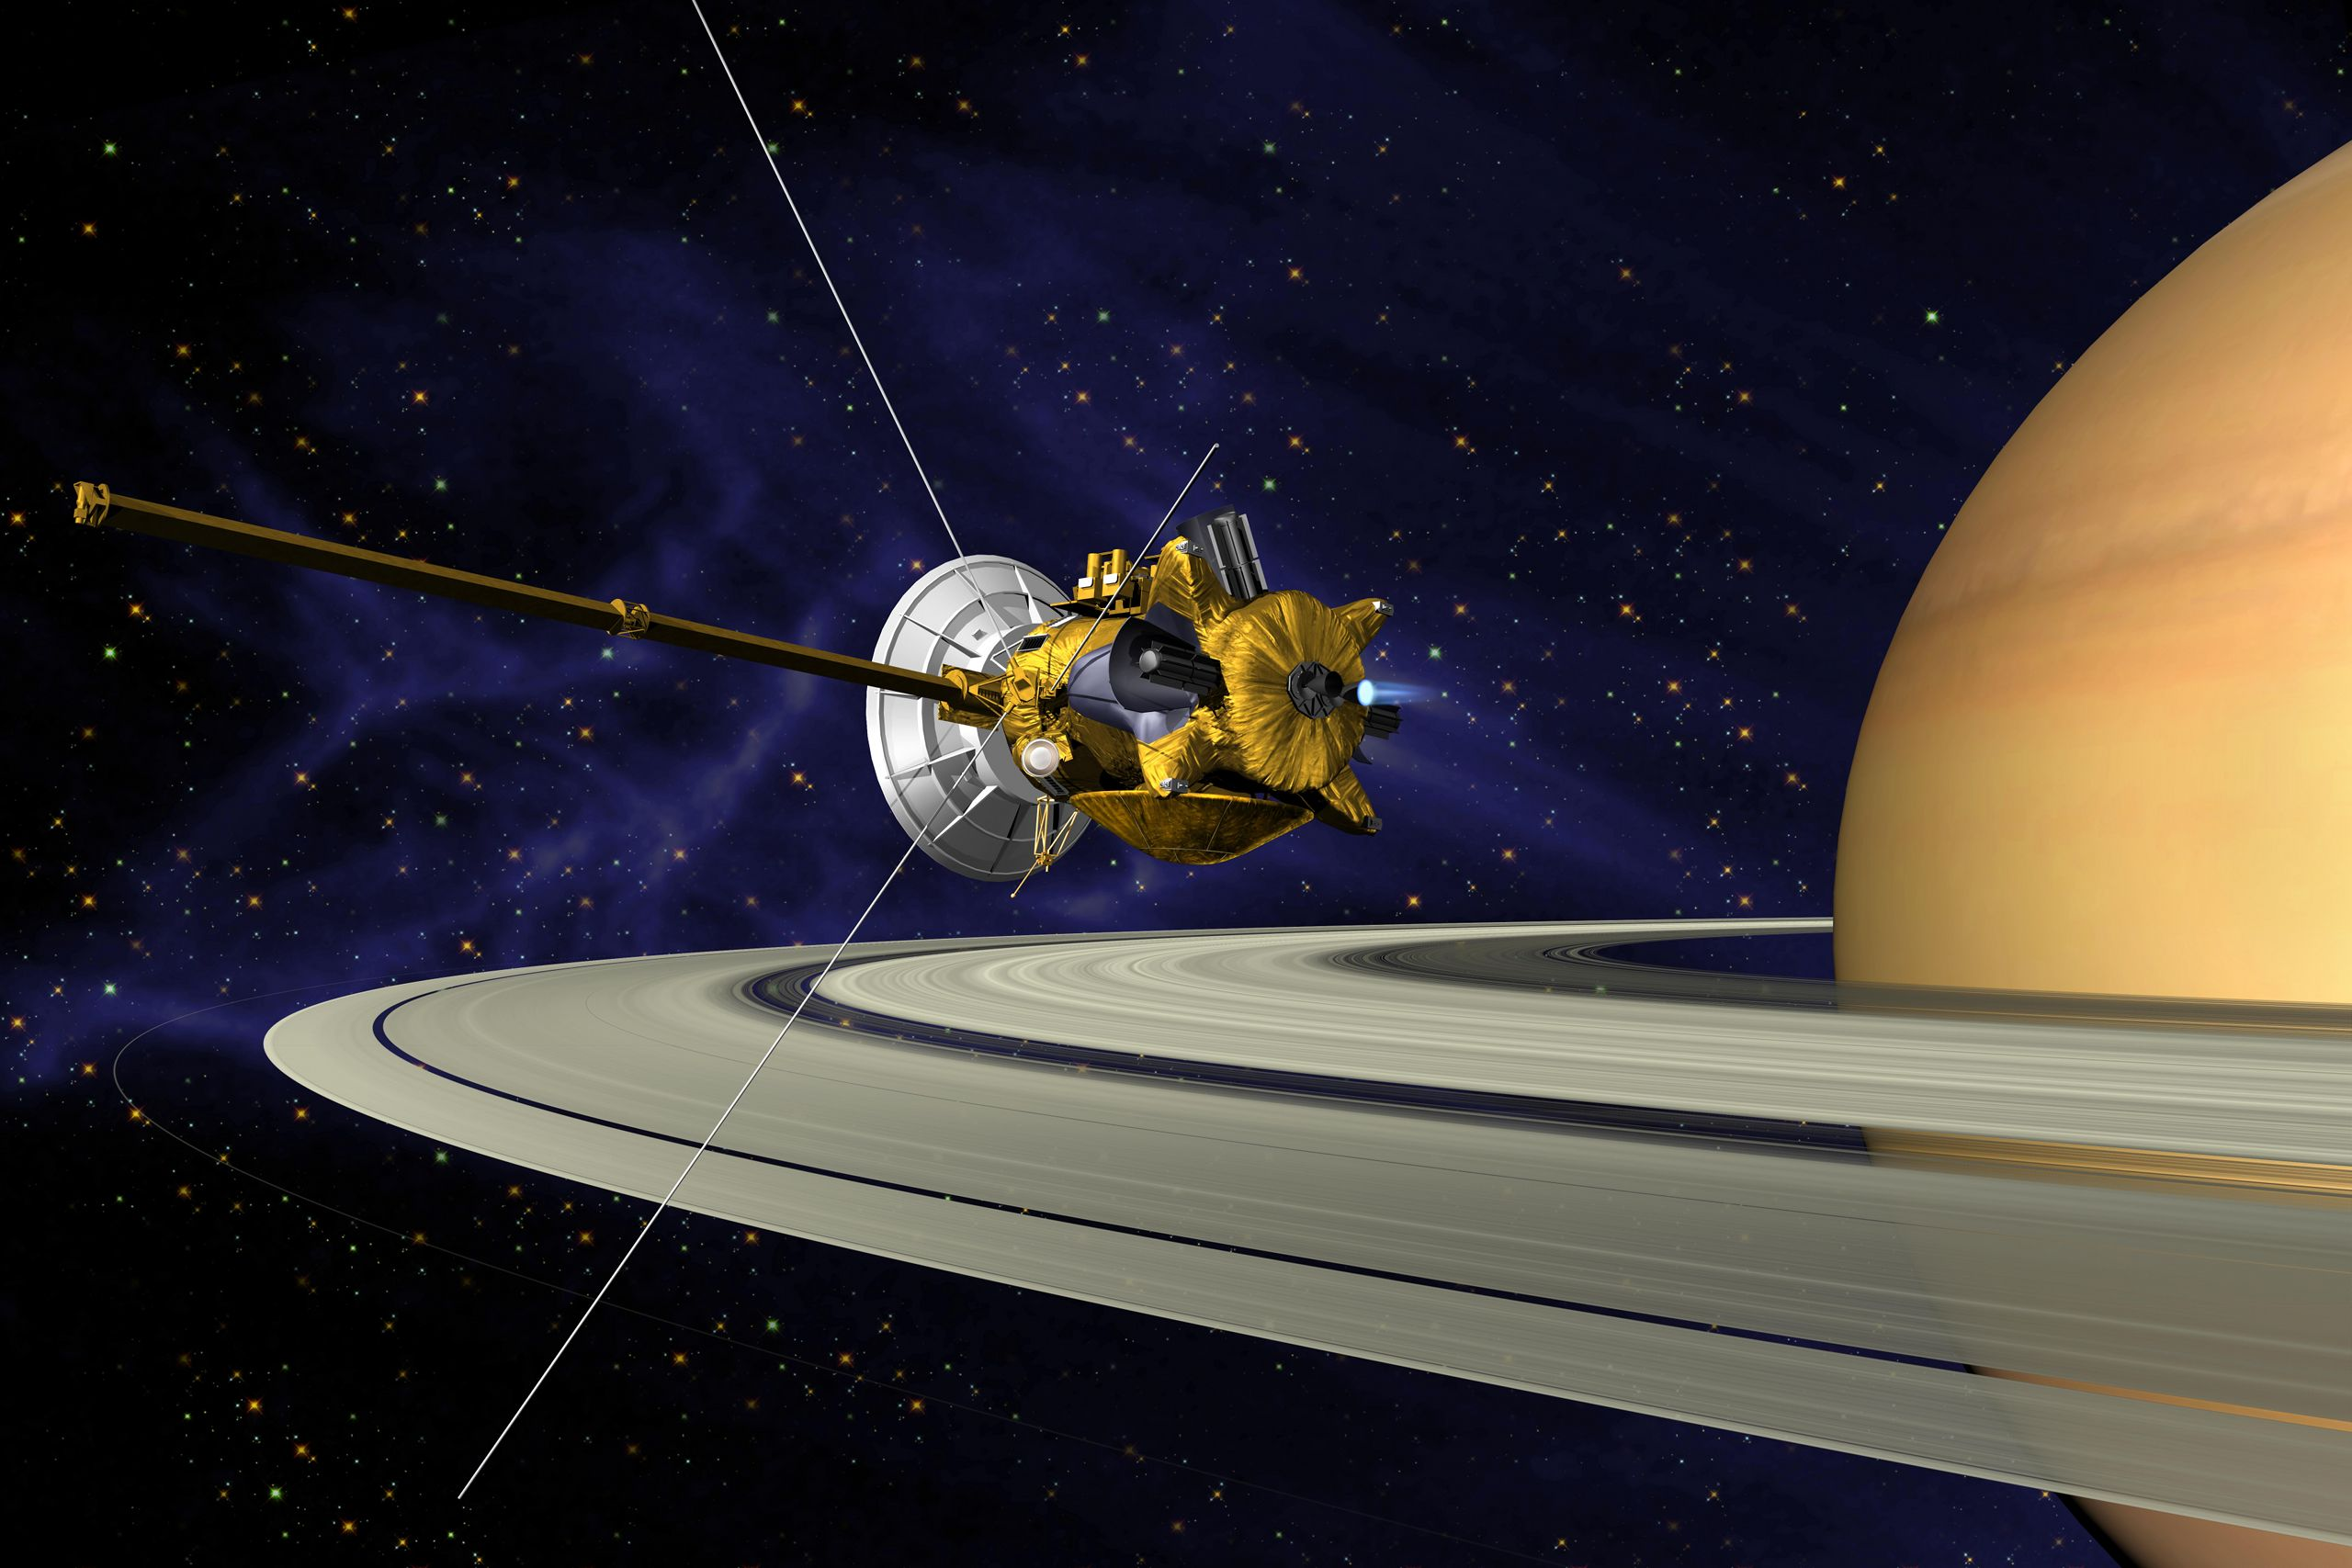 Cassini Orbiter Spacecraft Nasa Solar System Exploration